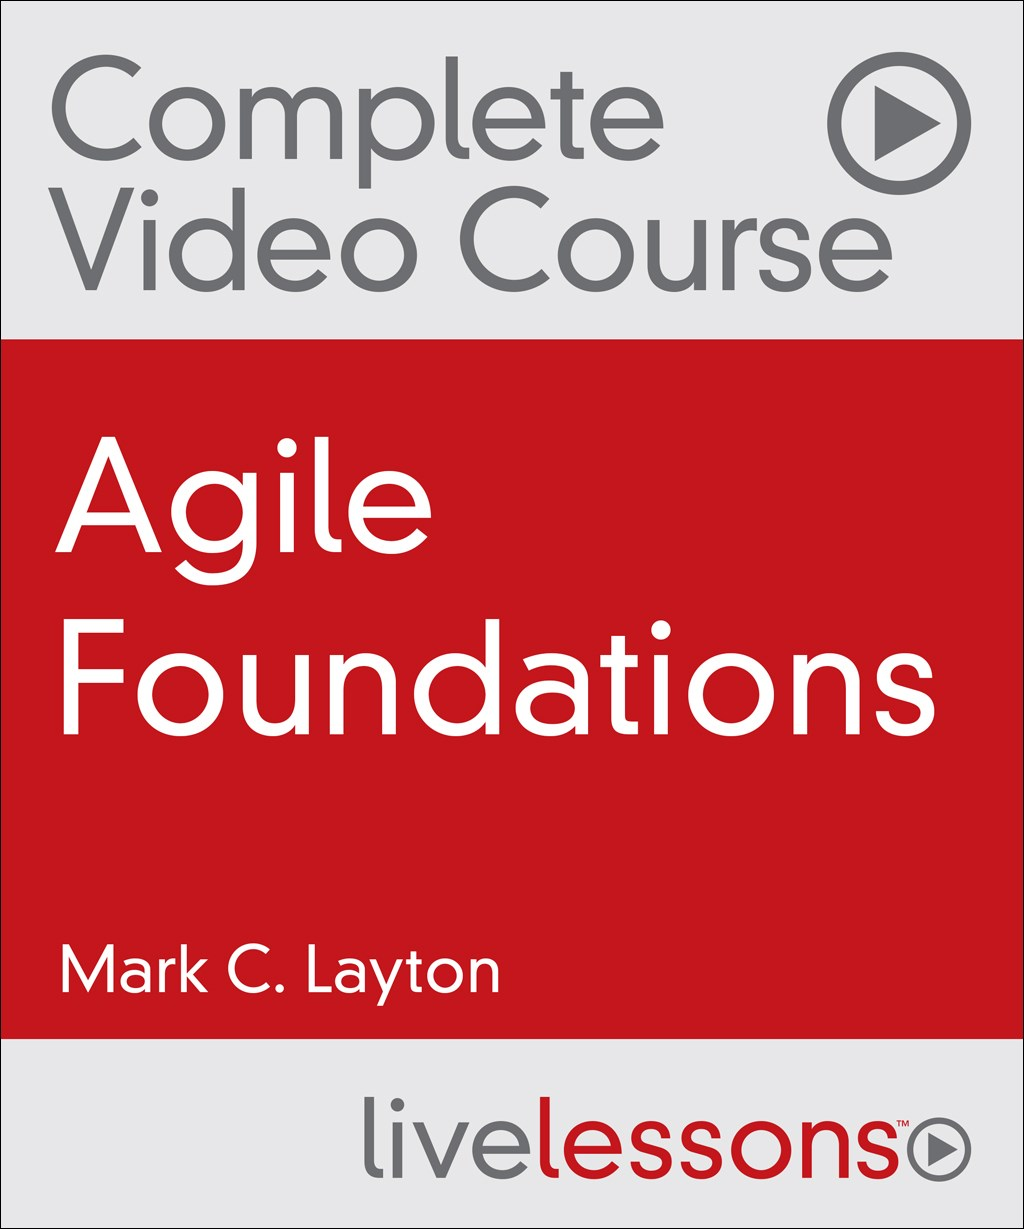 Agile Foundations Complete Video Course